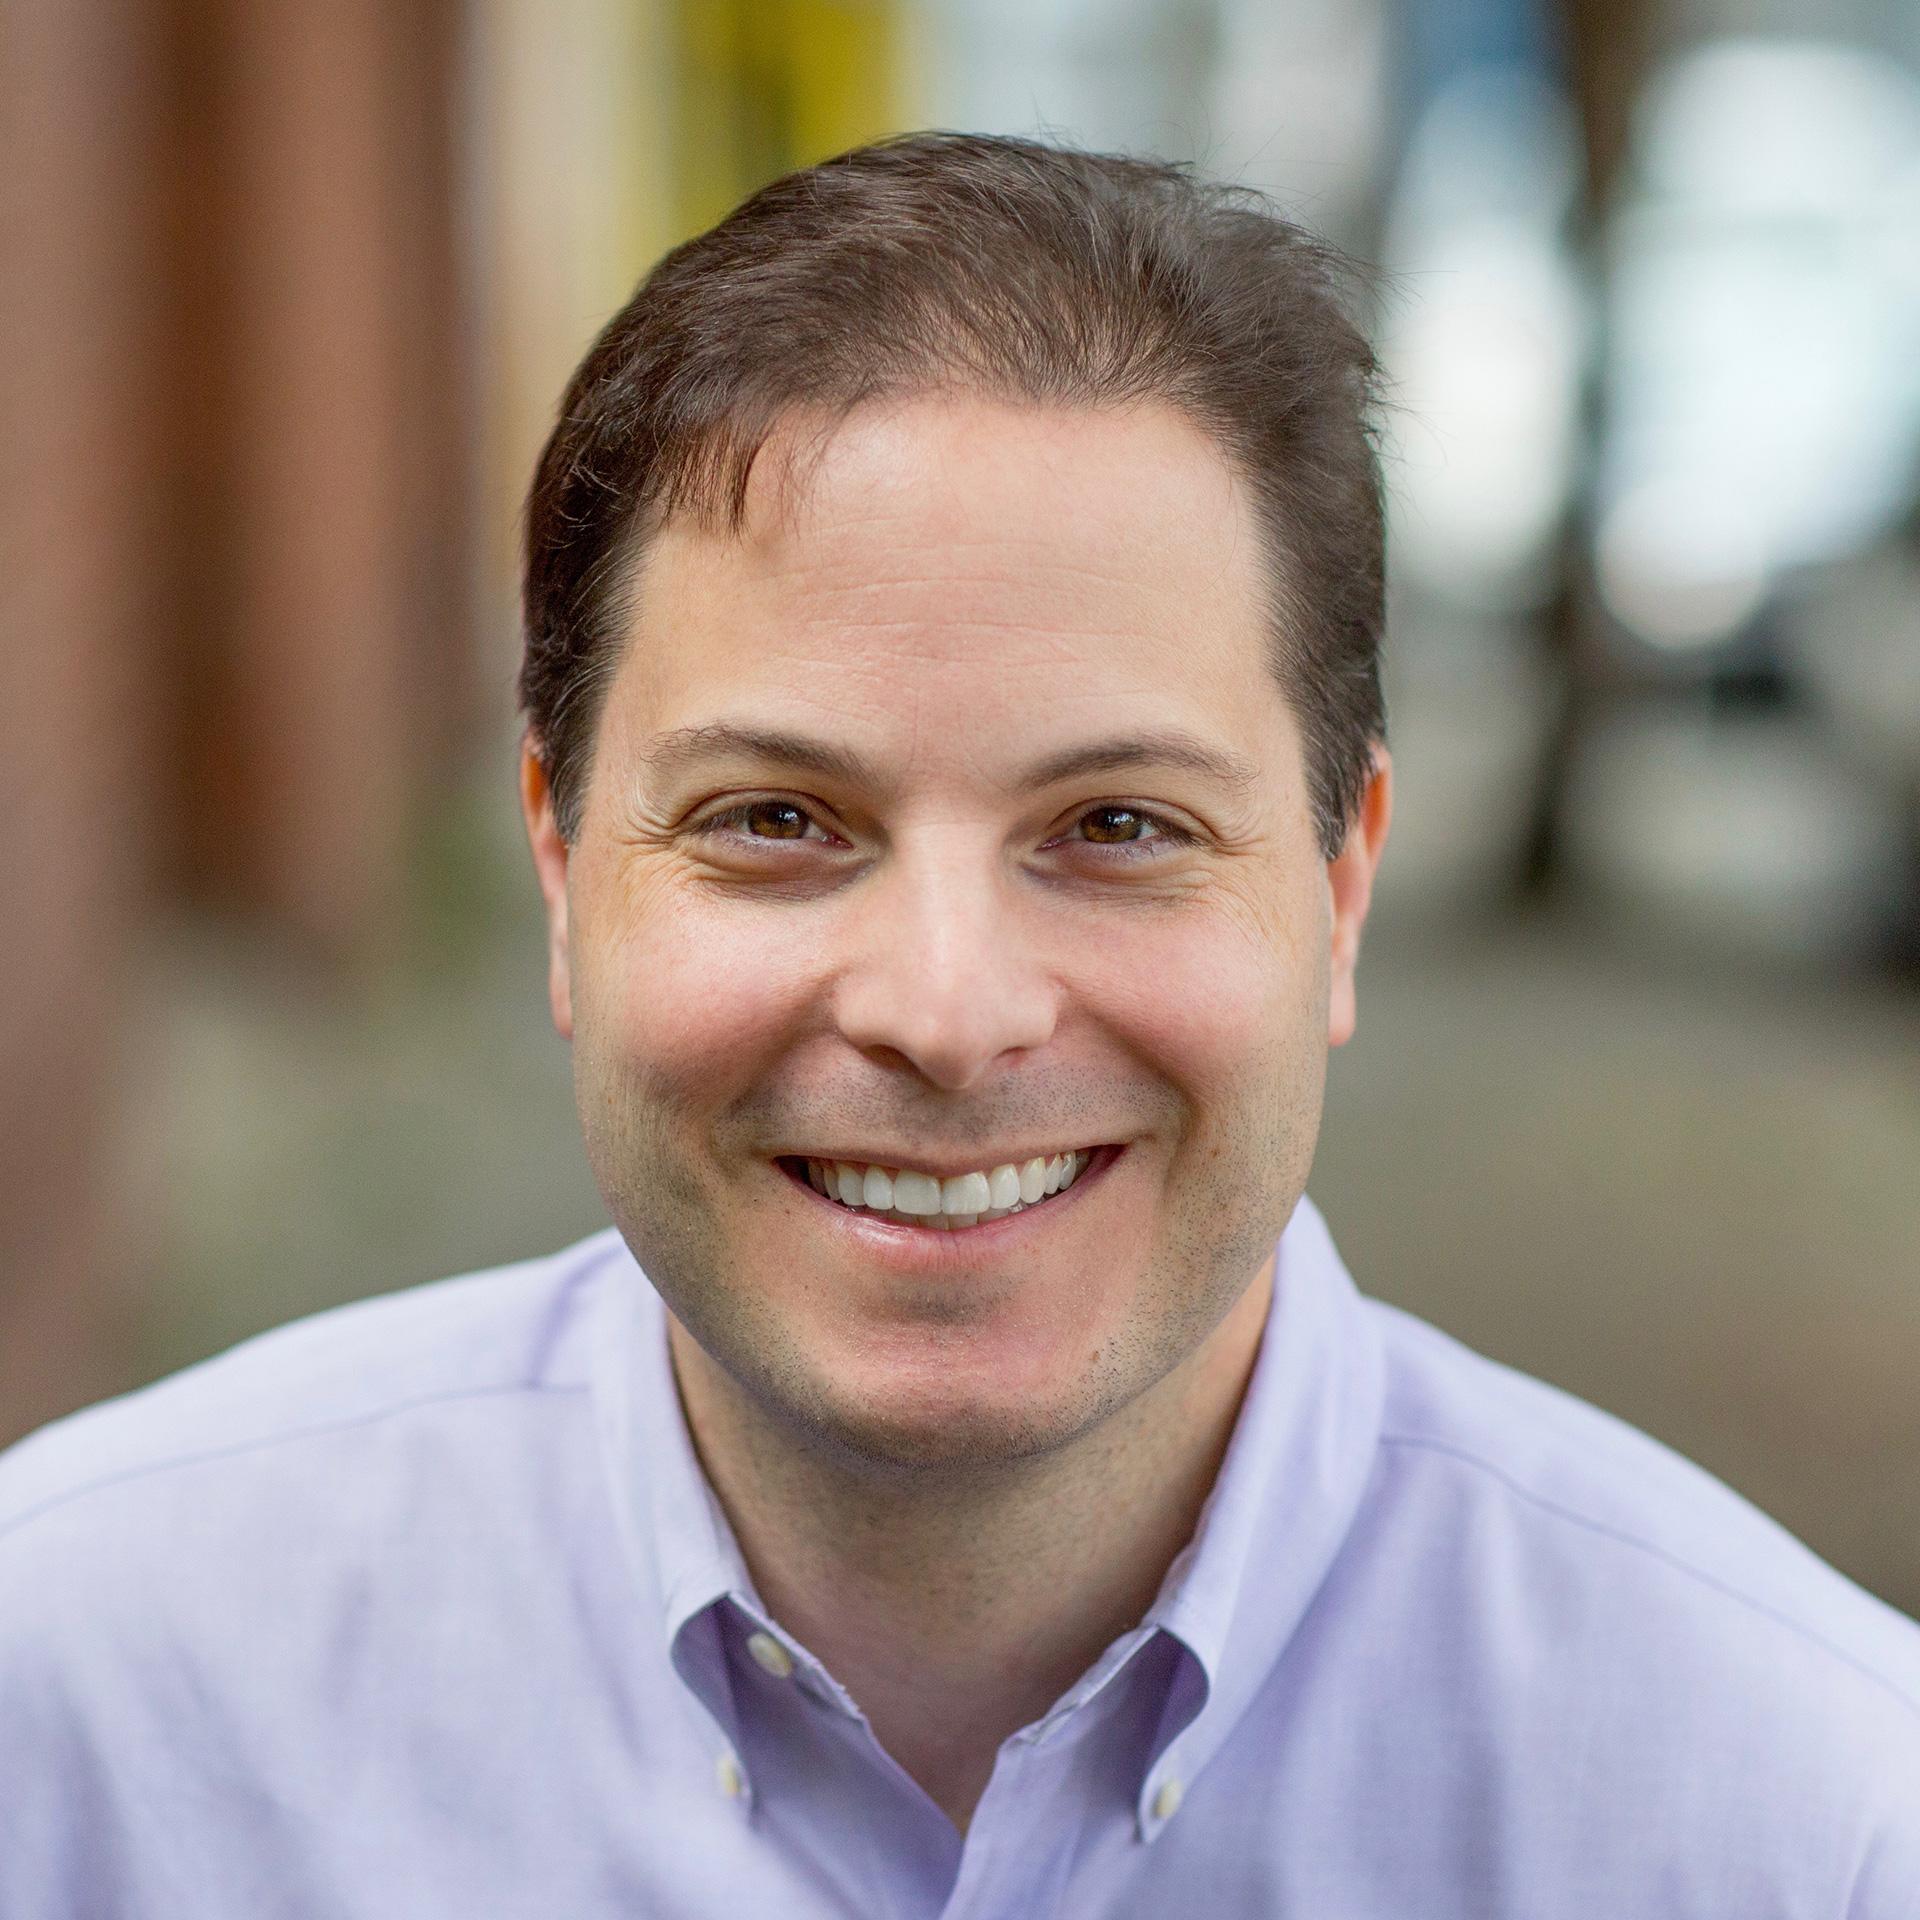 Paul Martino - General Partner